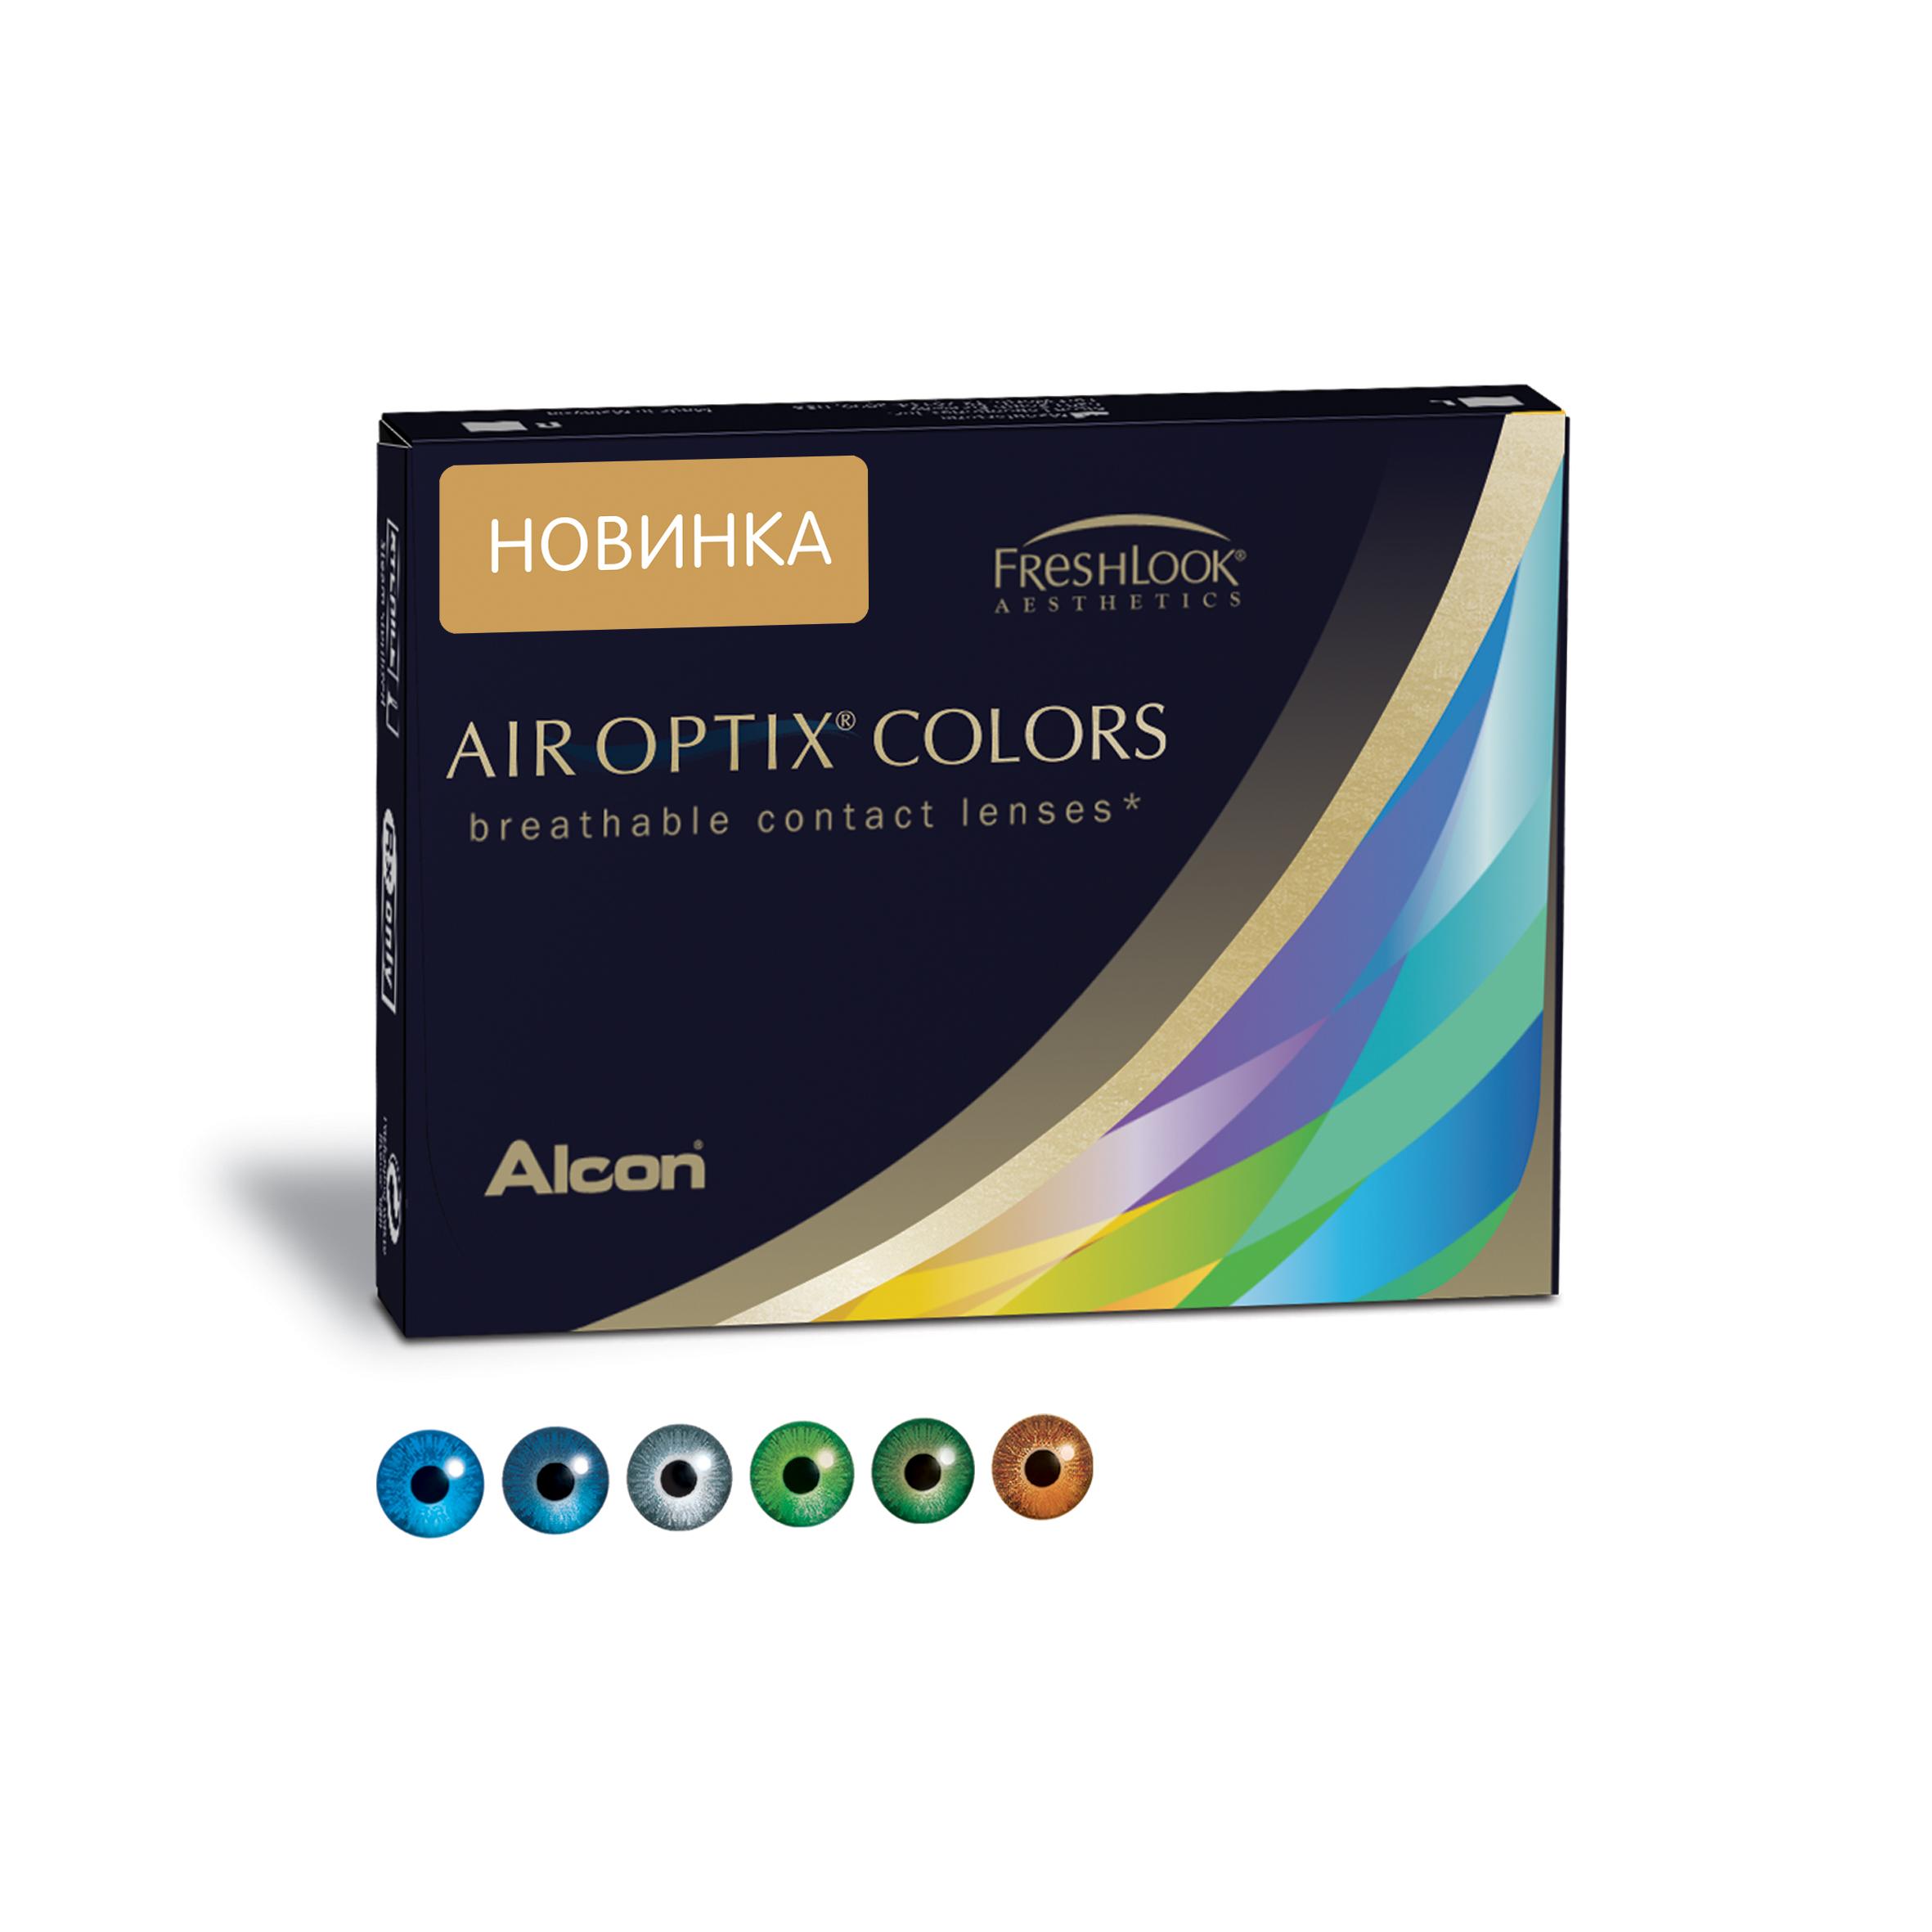 Аlcon контактные линзы Air Optix Colors 2 шт -0.00 Sterling Gray31746093Мягкие контактные линзы